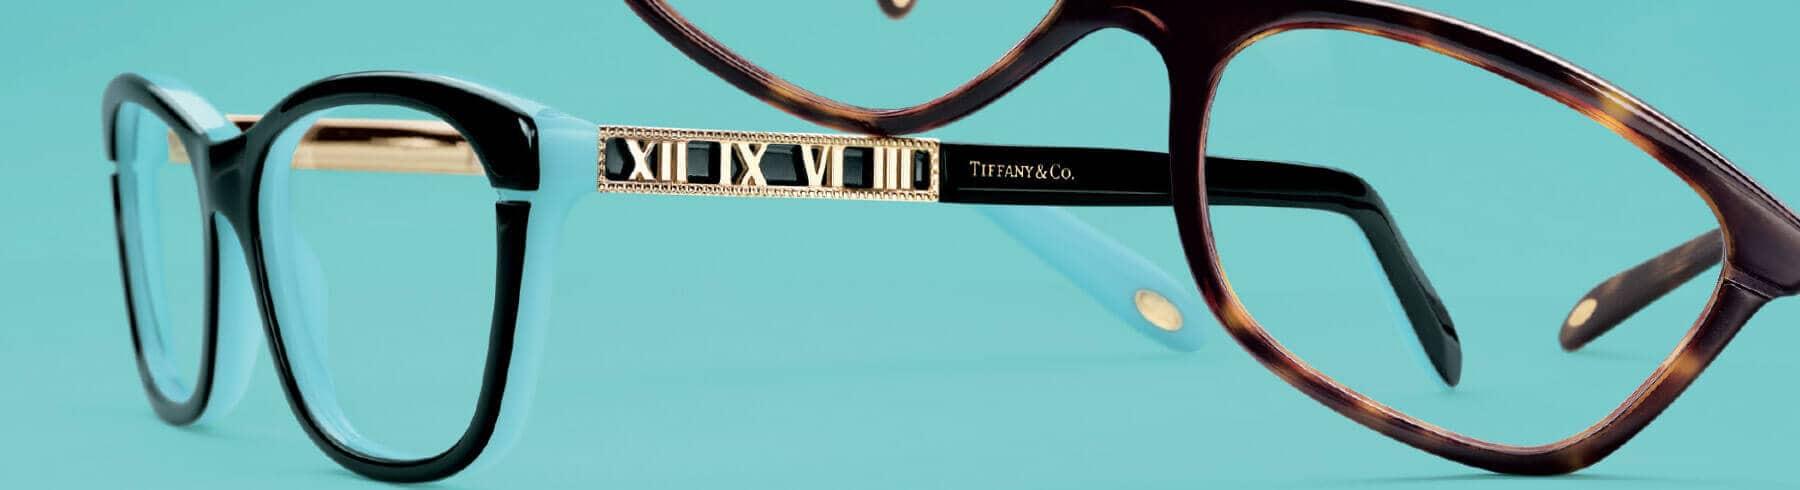 tiffany-banner-min